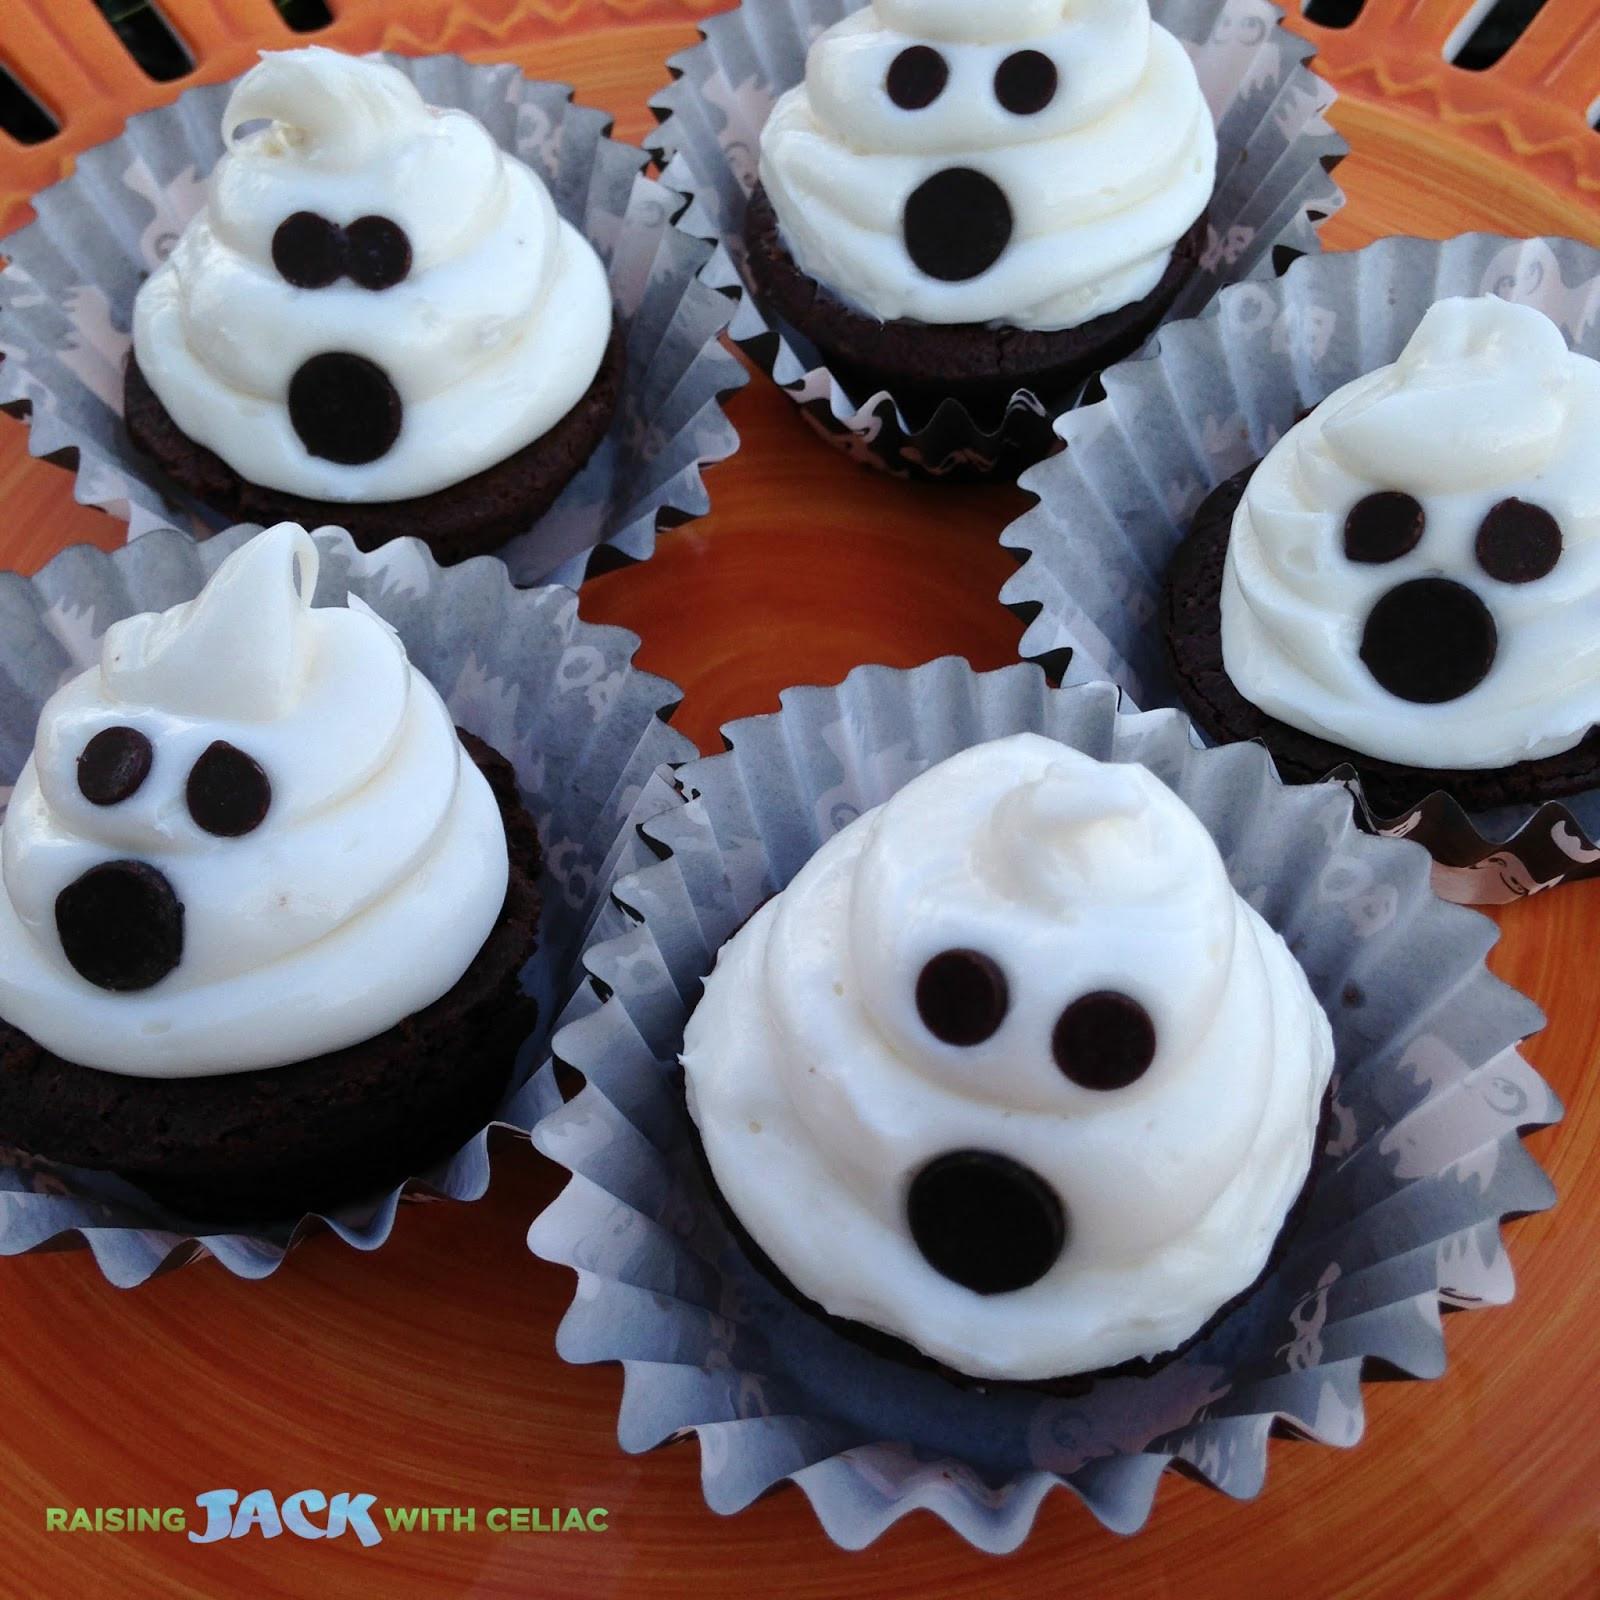 Gluten Free Halloween Cookies  Raising Jack With Celiac Gluten Free Allergy Friendly